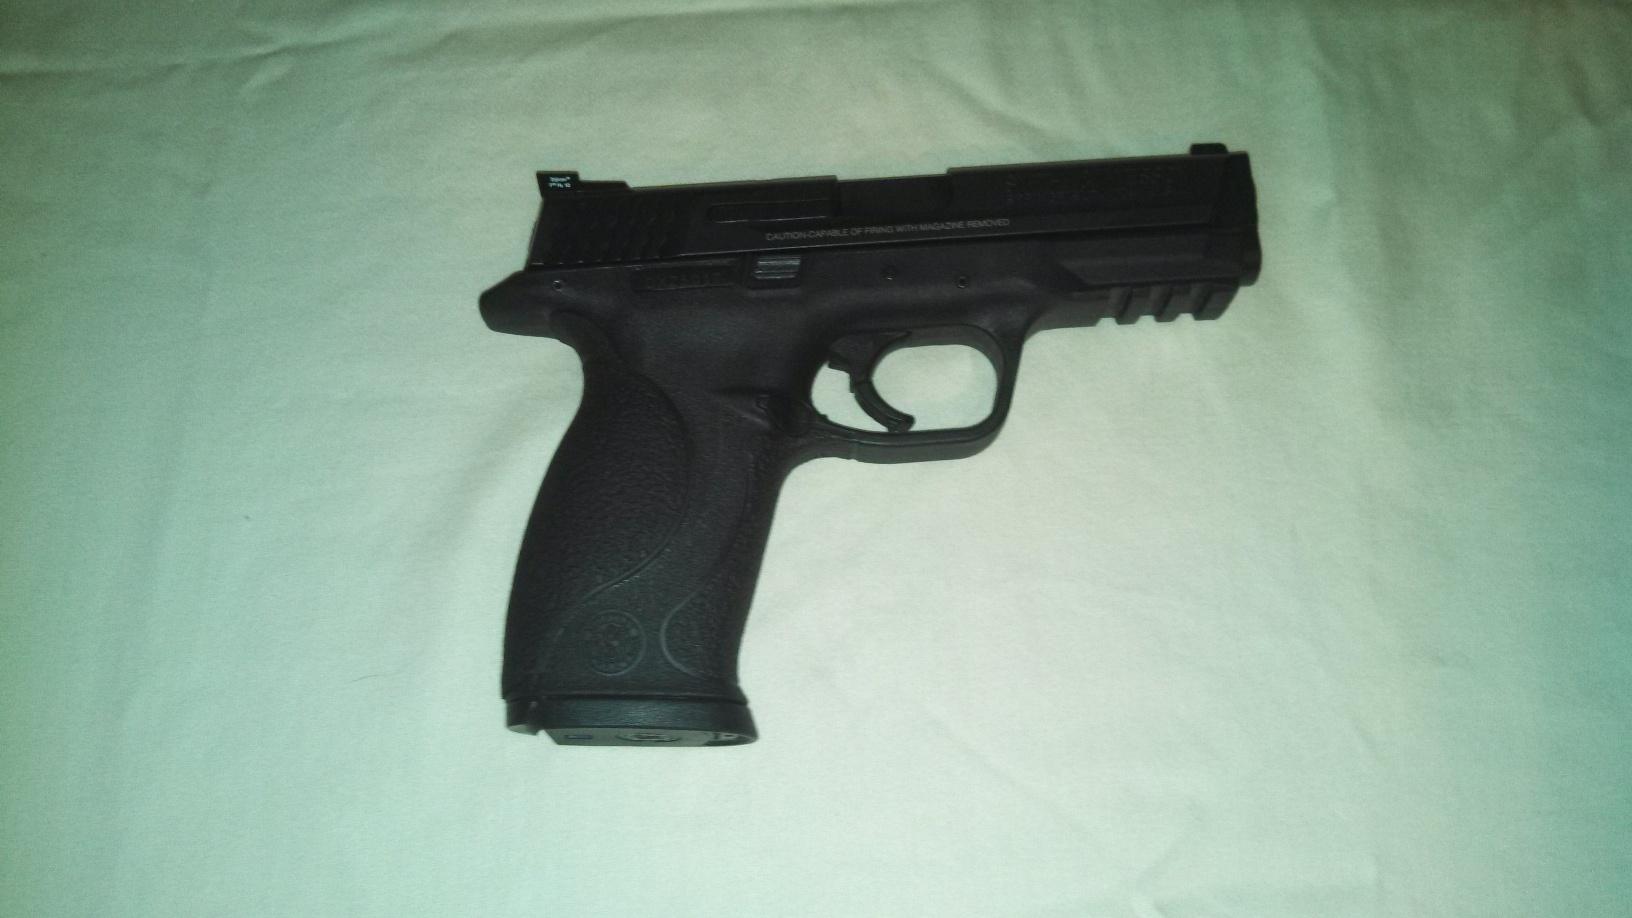 WTS:  Full size 9mm M&P-img_20140525_135059_804.jpg